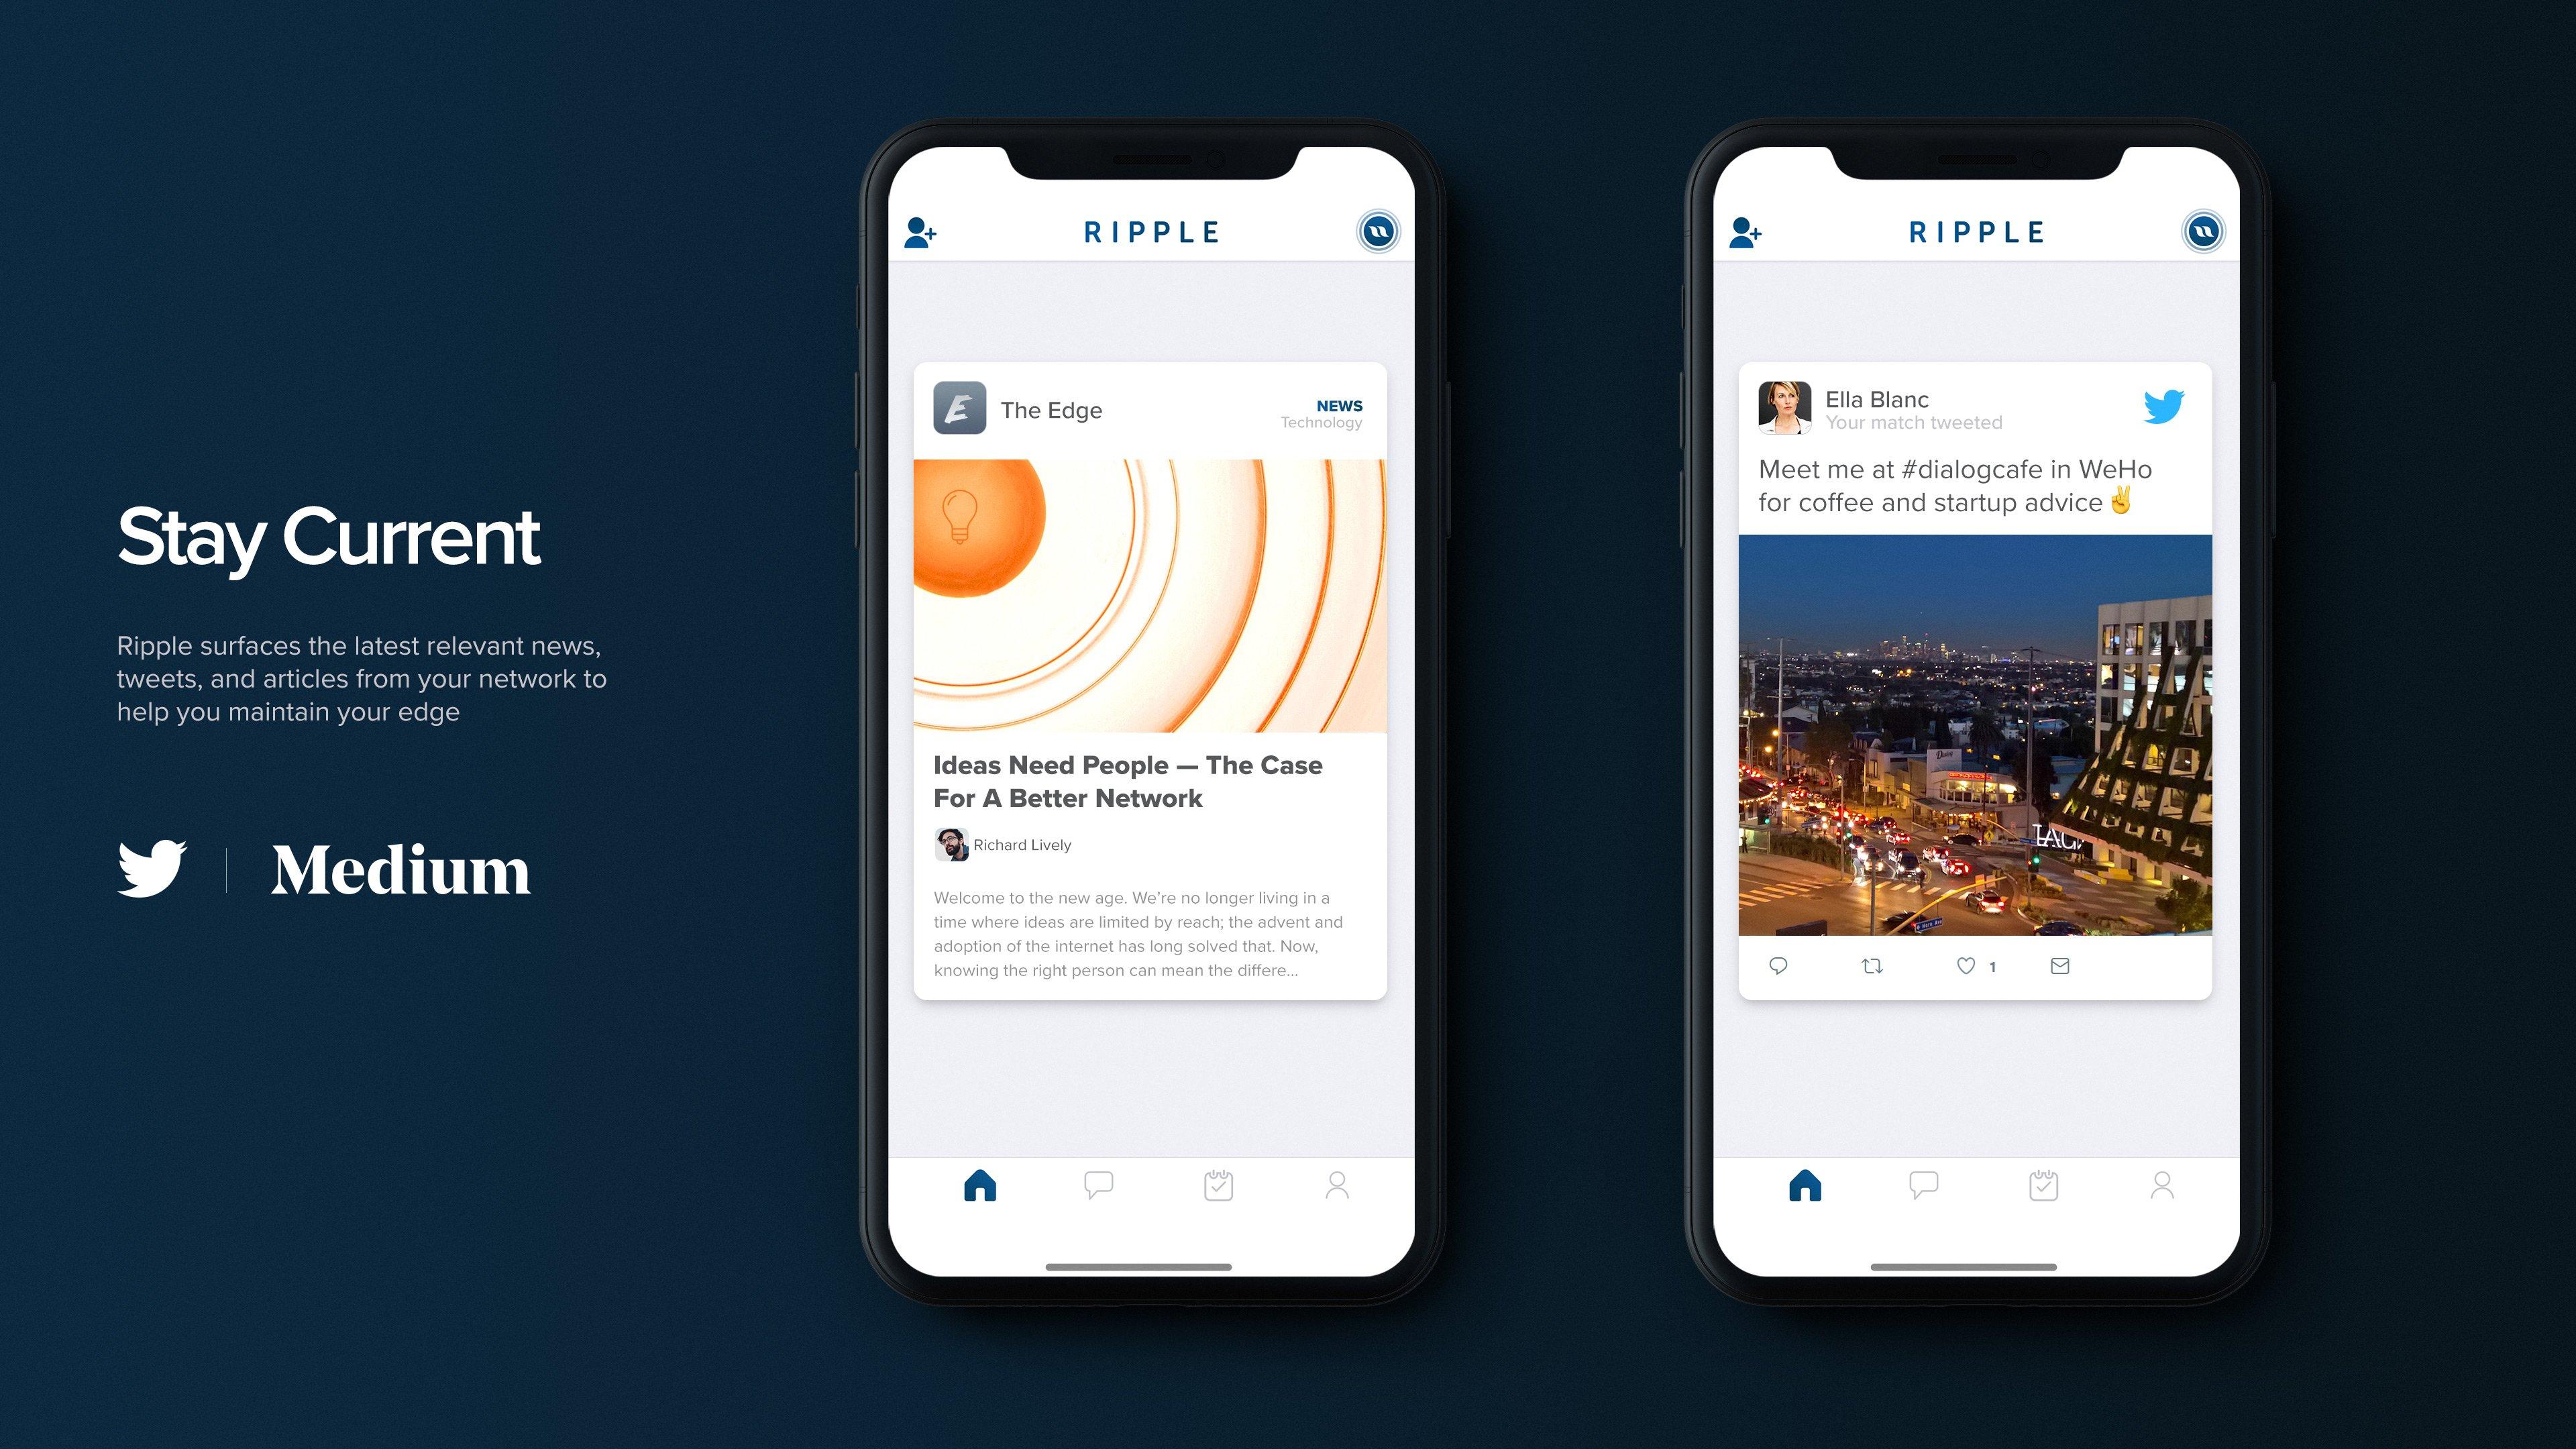 Ripple networking app News